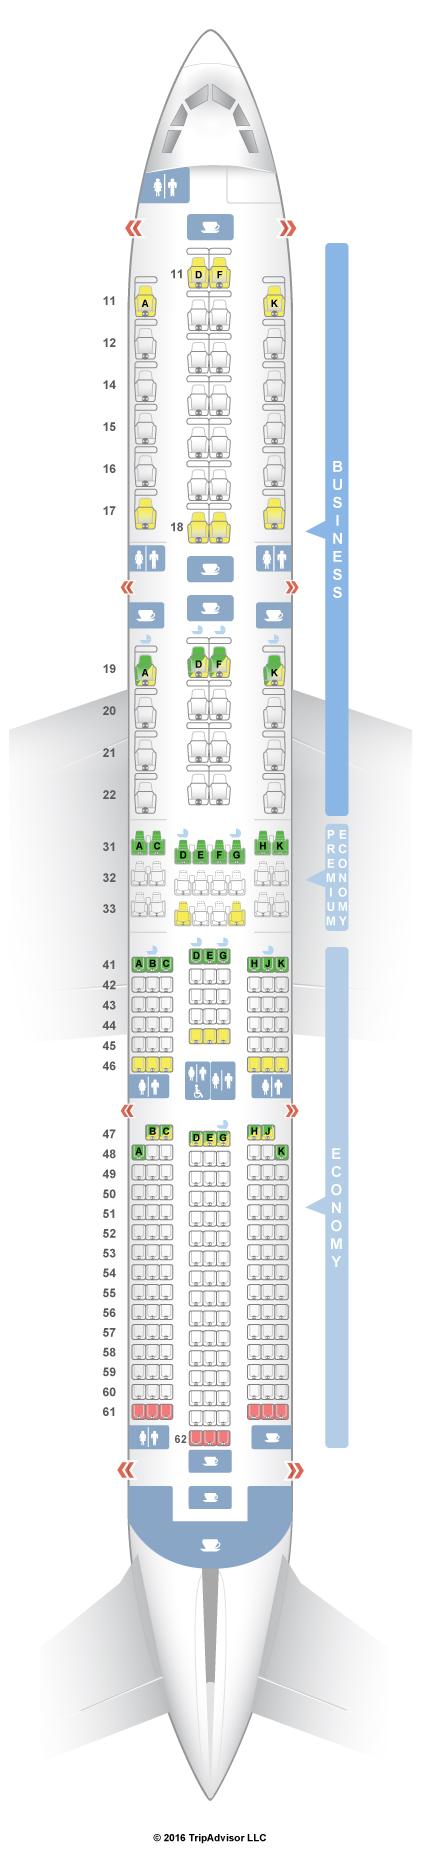 SeatGuru Seat Map Singapore Airlines Airbus A350-900 (359)